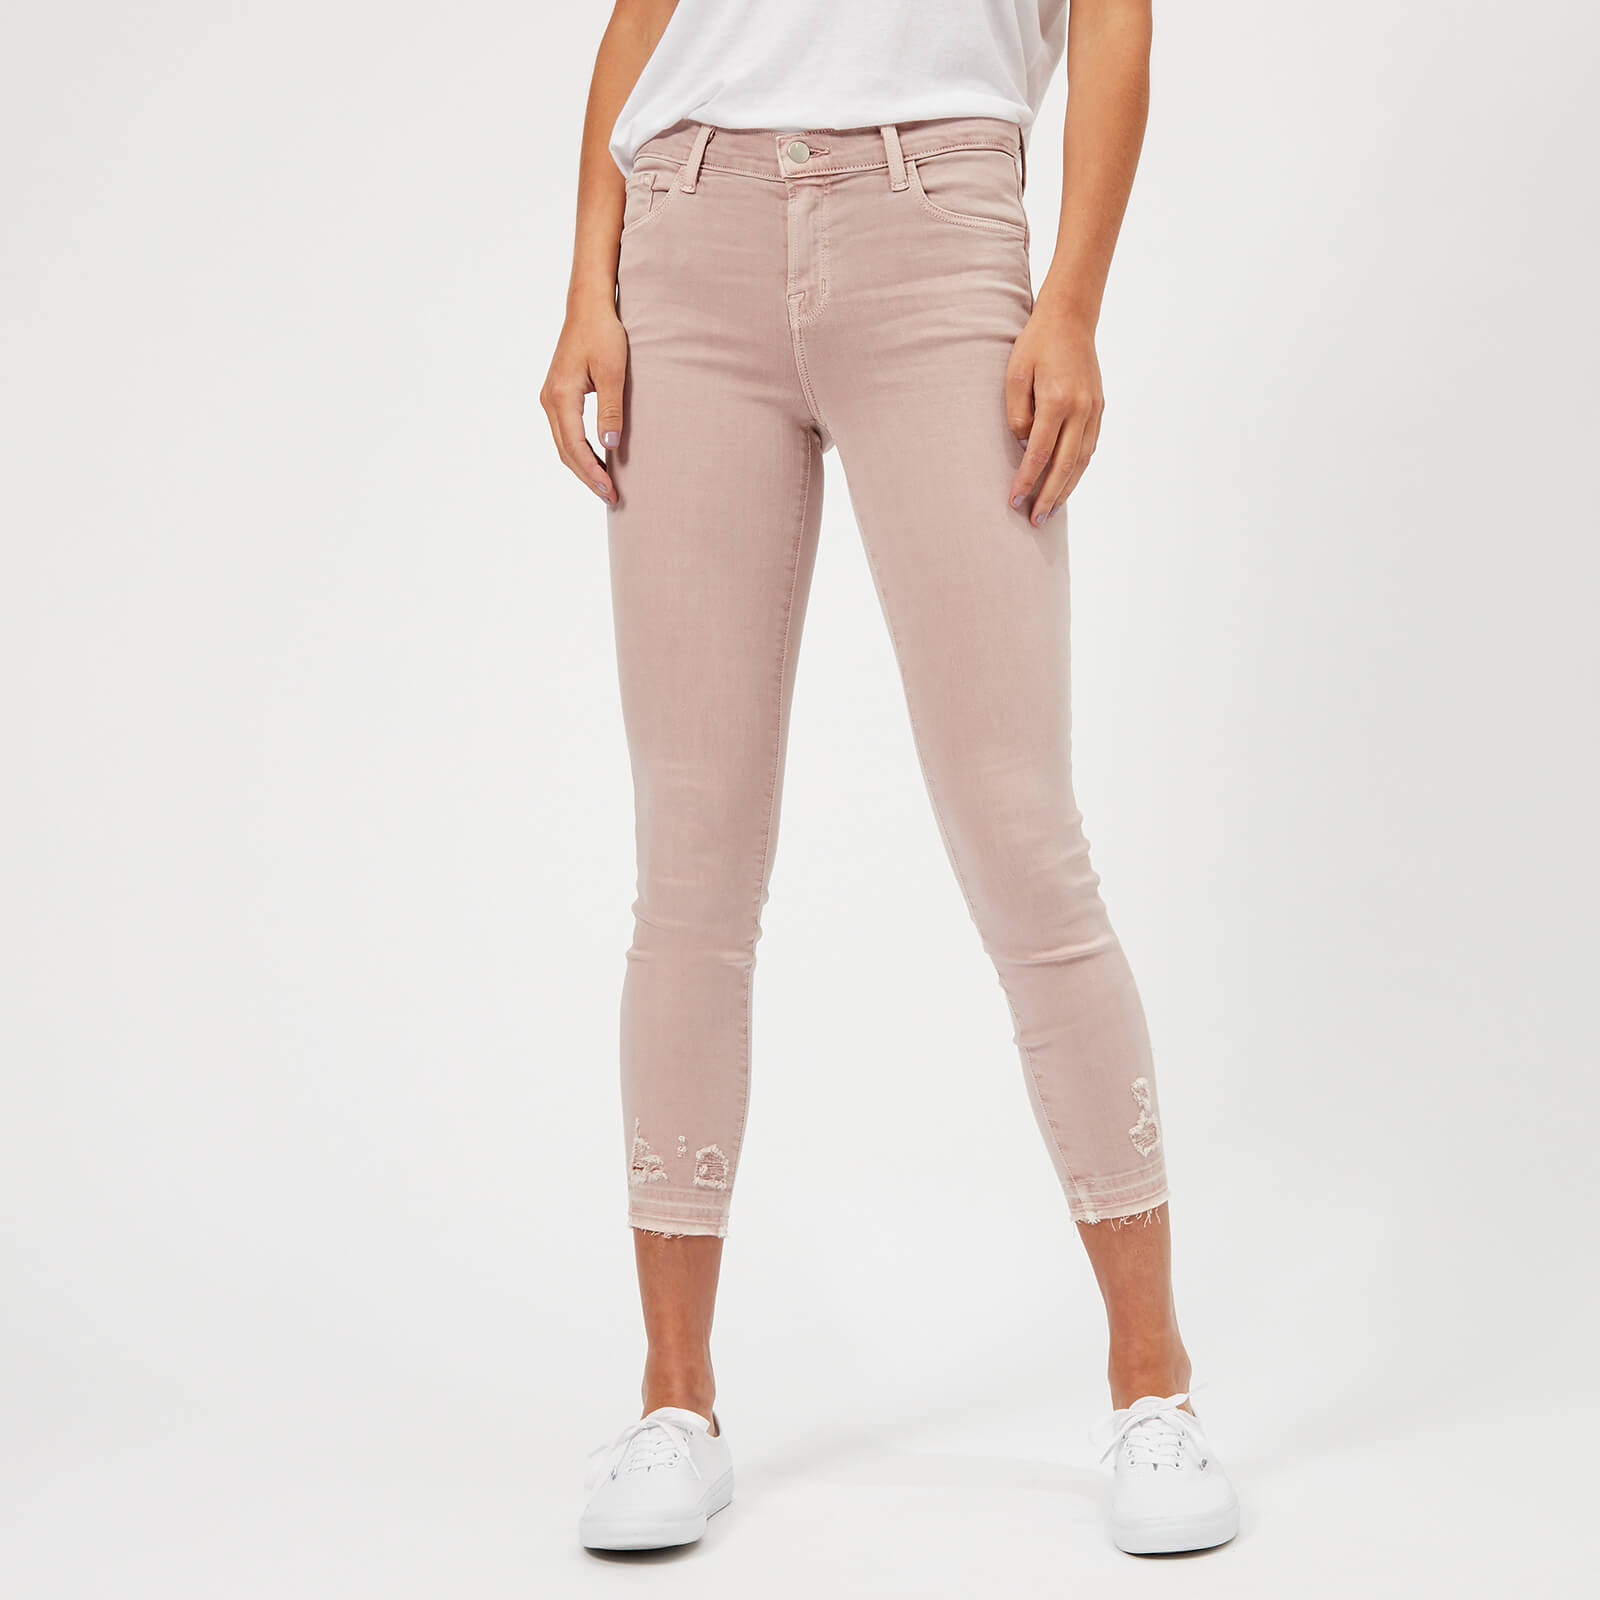 J Brand Jeans Womens 835 Mid Rise Capri